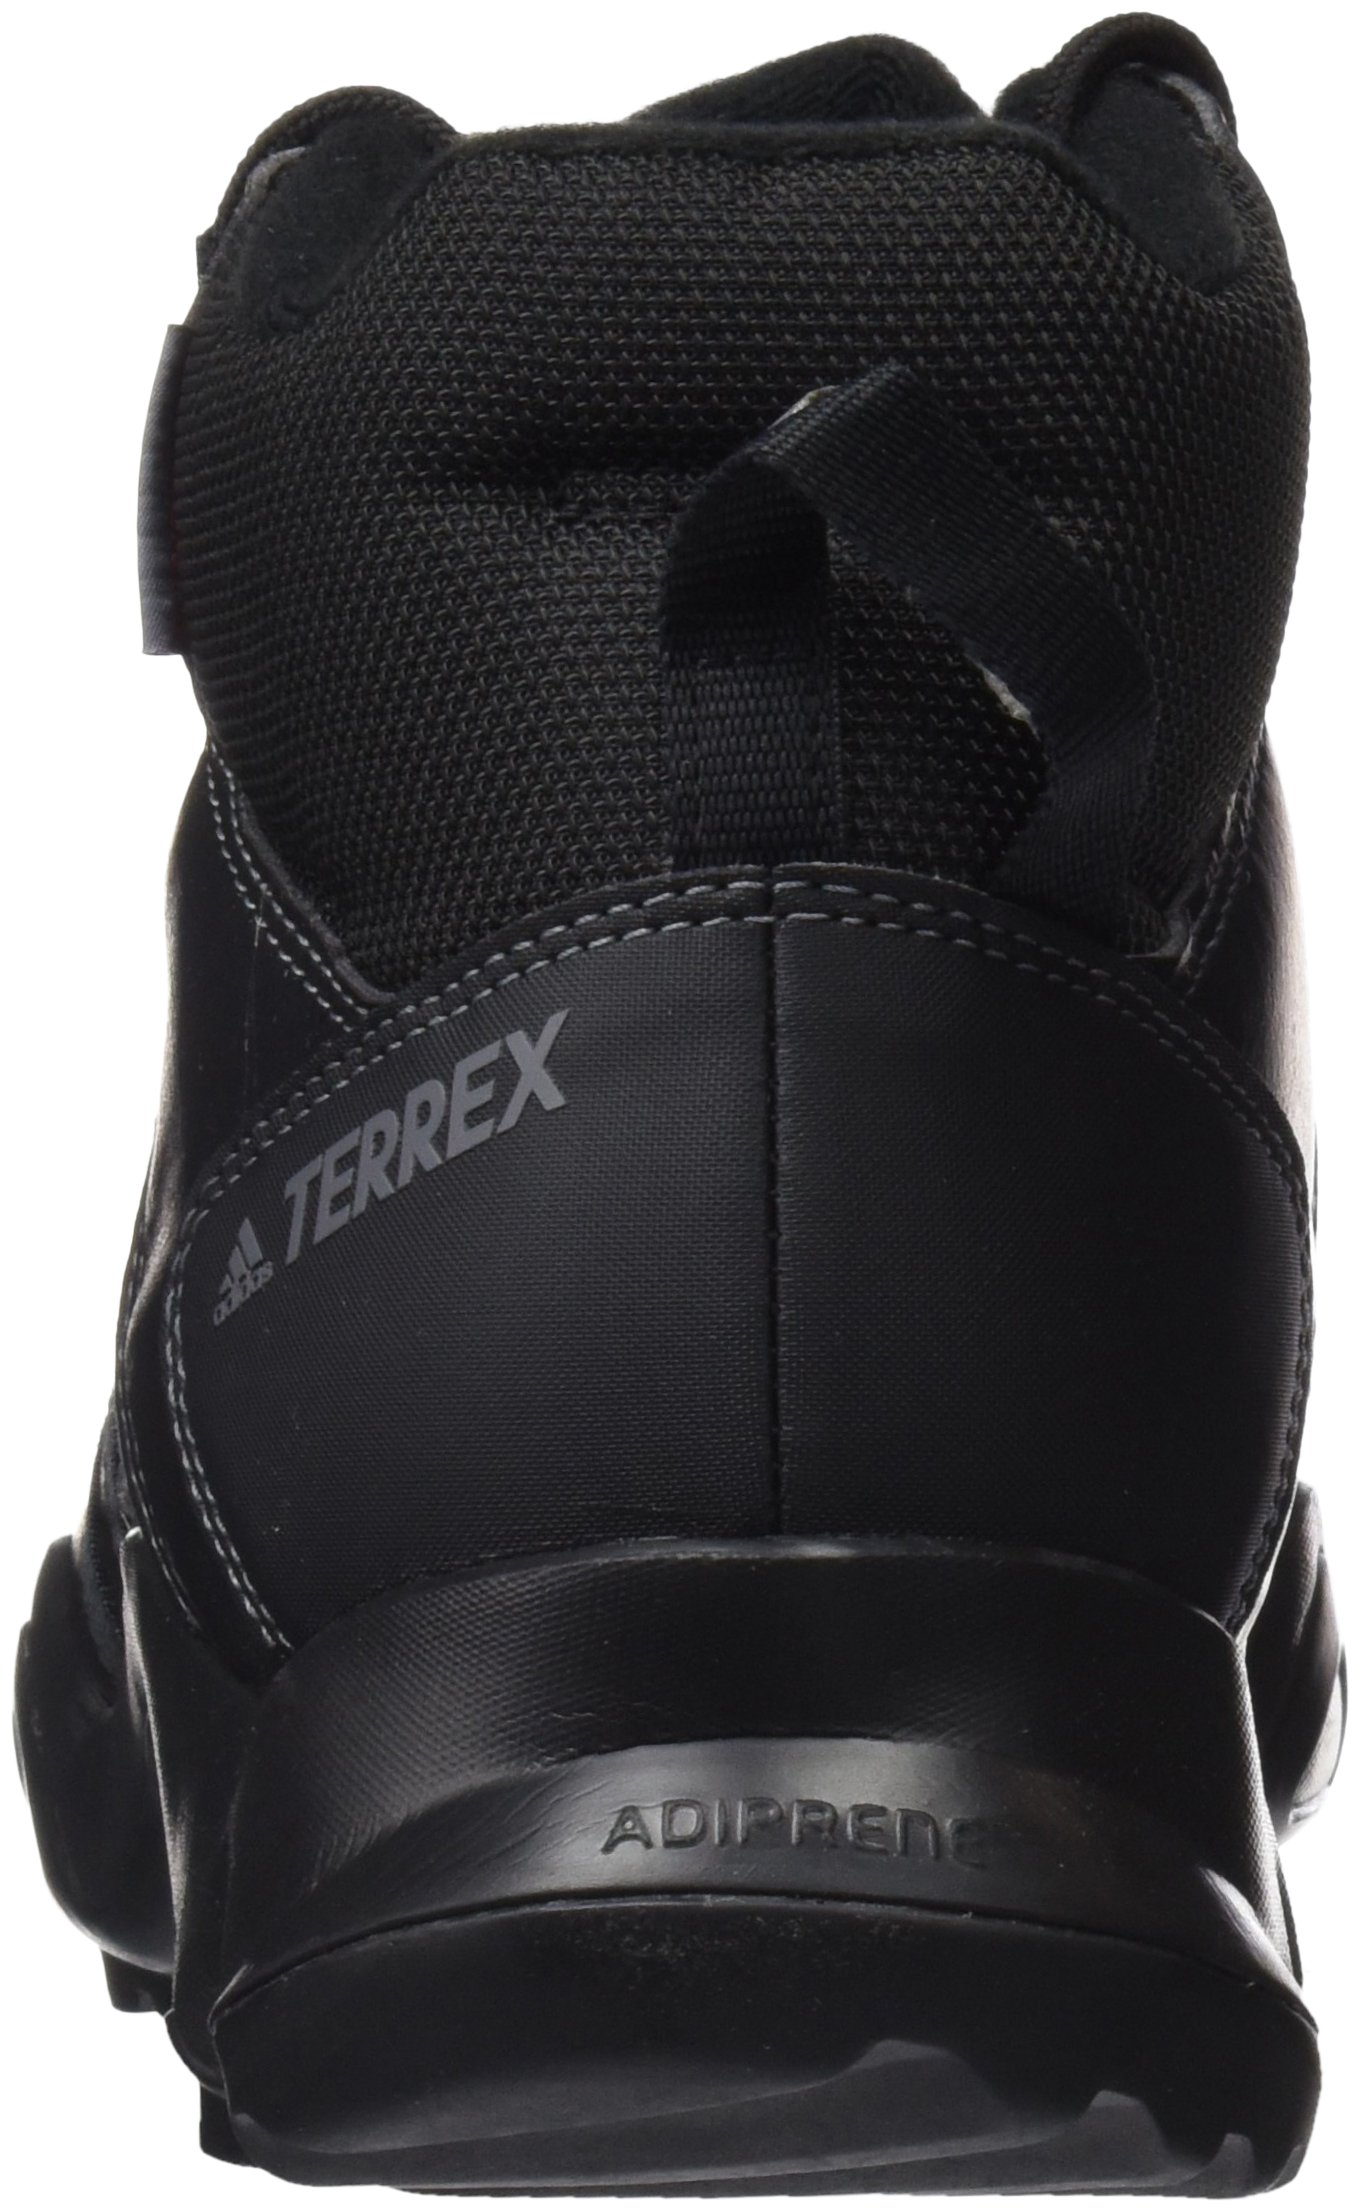 81n3V8ZDzFL - adidas Men's Terrex Ax2r Beta Mid Cw High Rise Hiking Boots